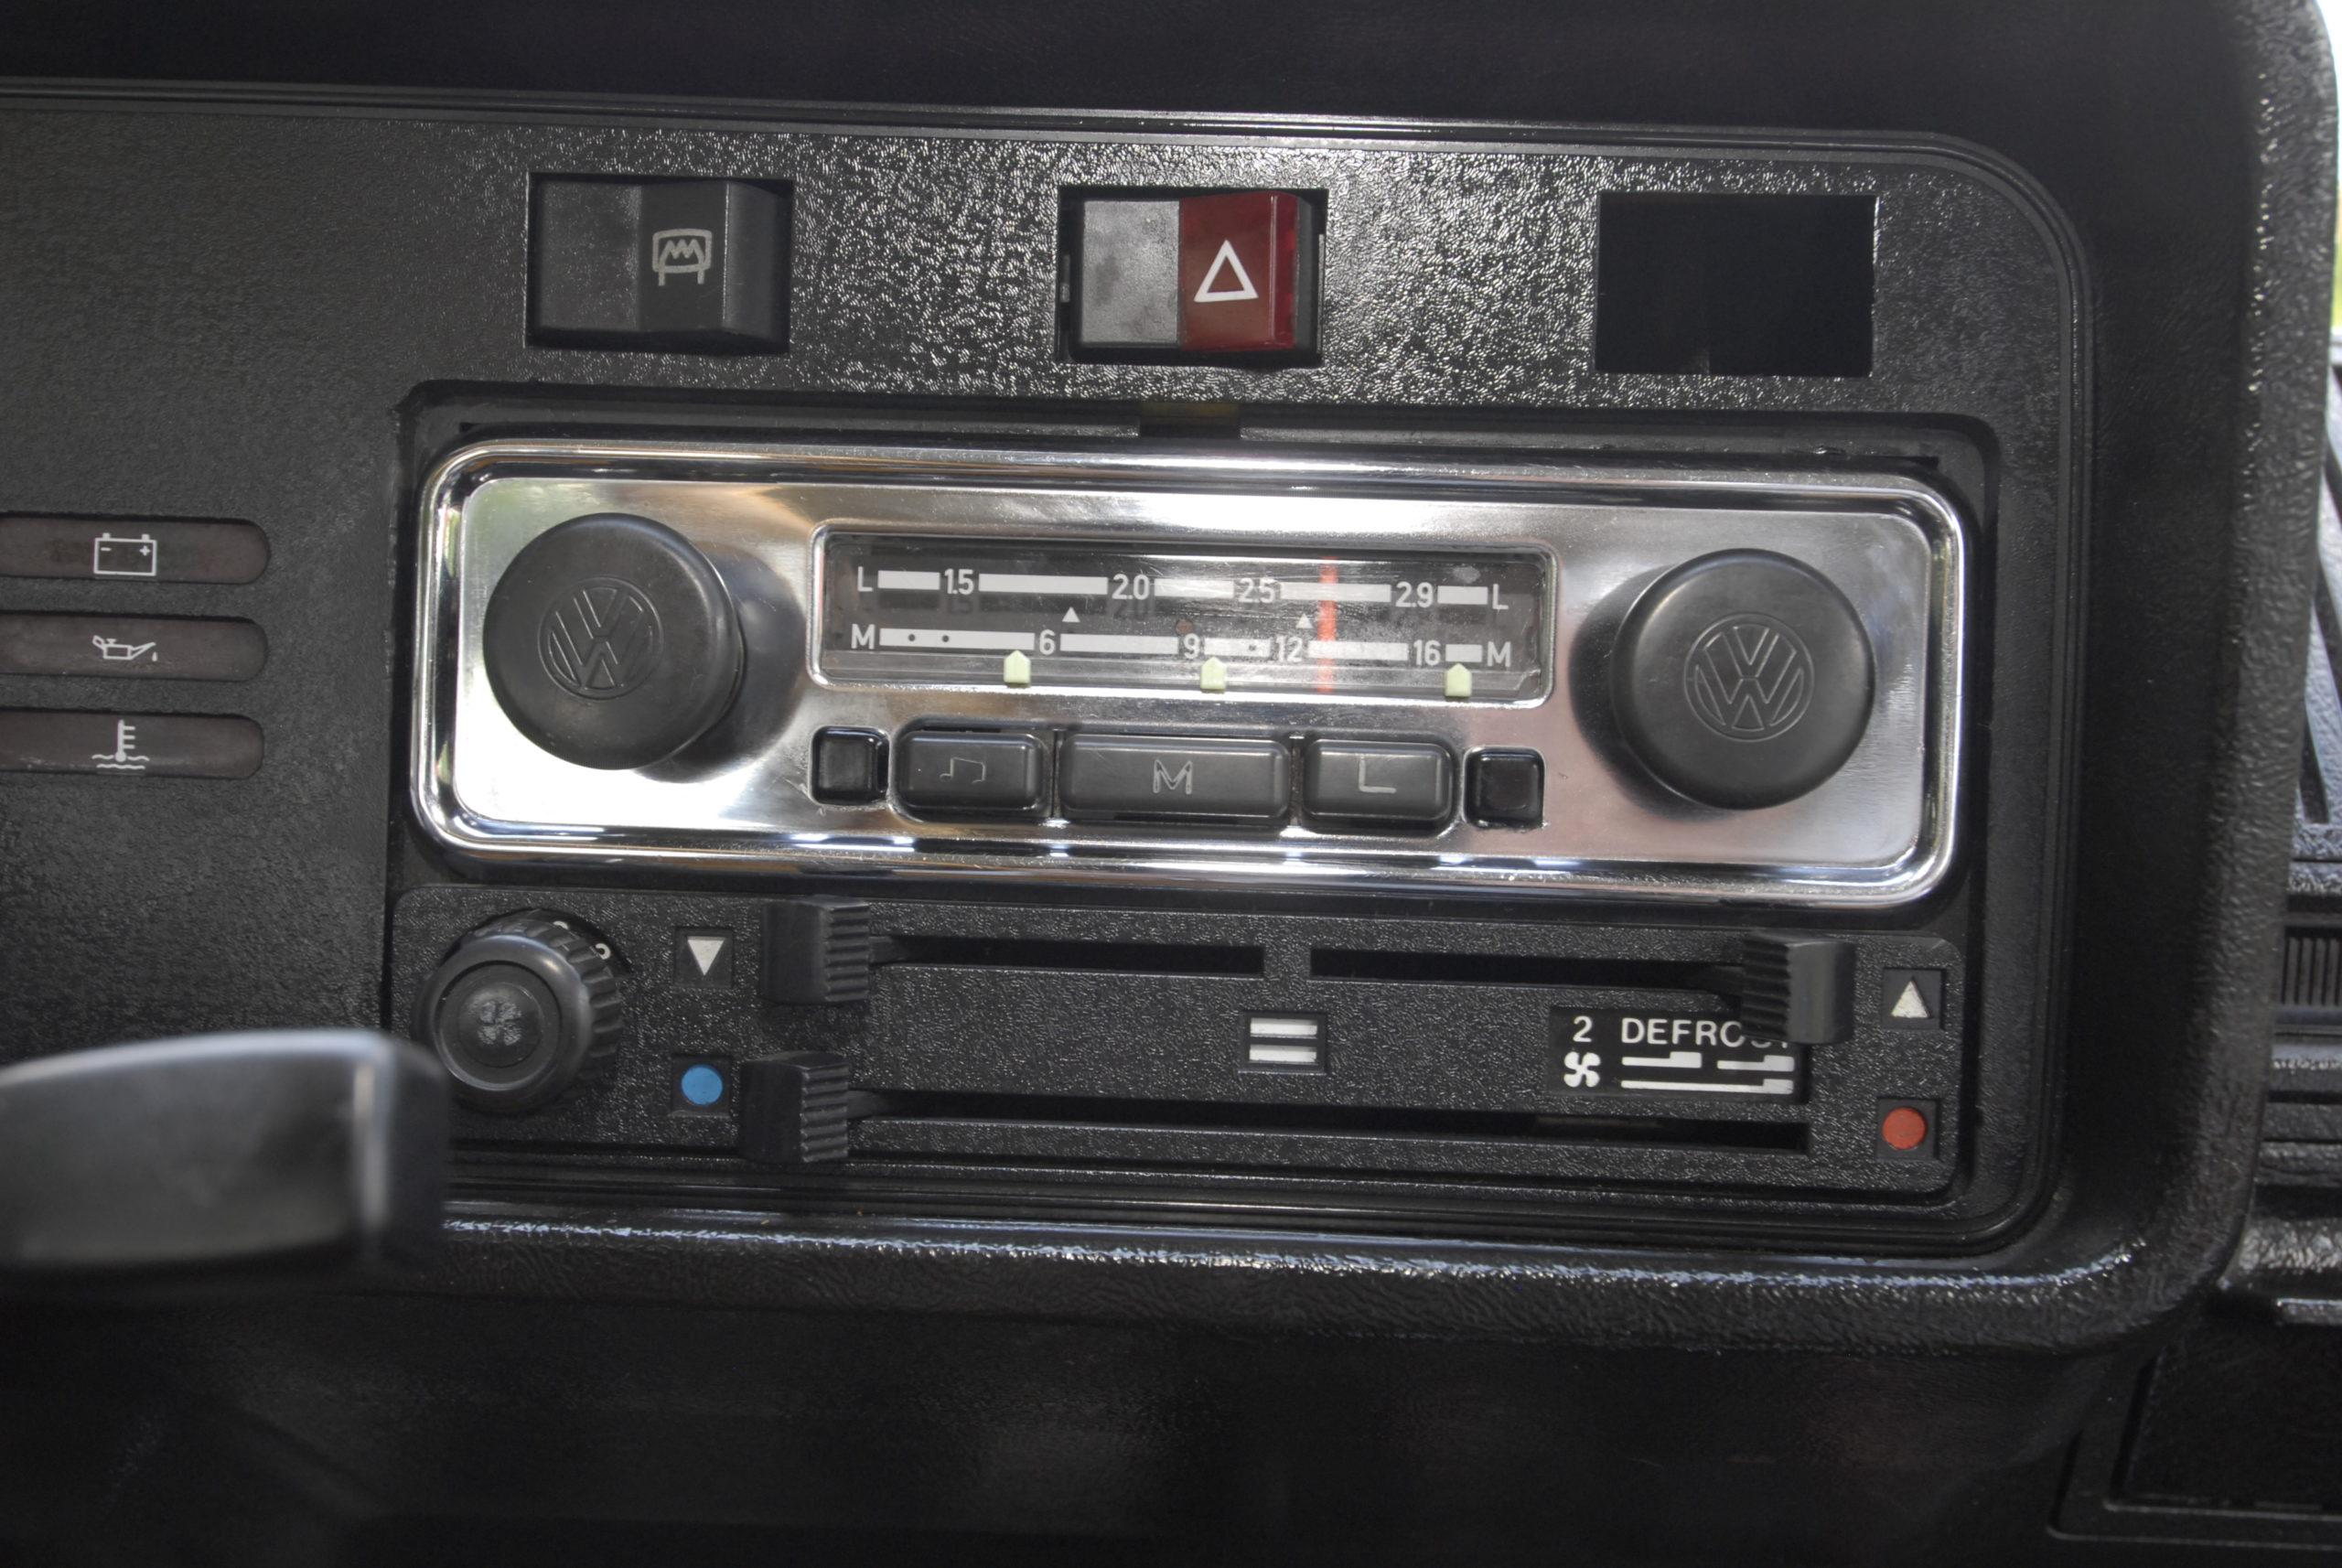 Tuning-VW-Golf-Mk1-CL-radio Blaupunkt